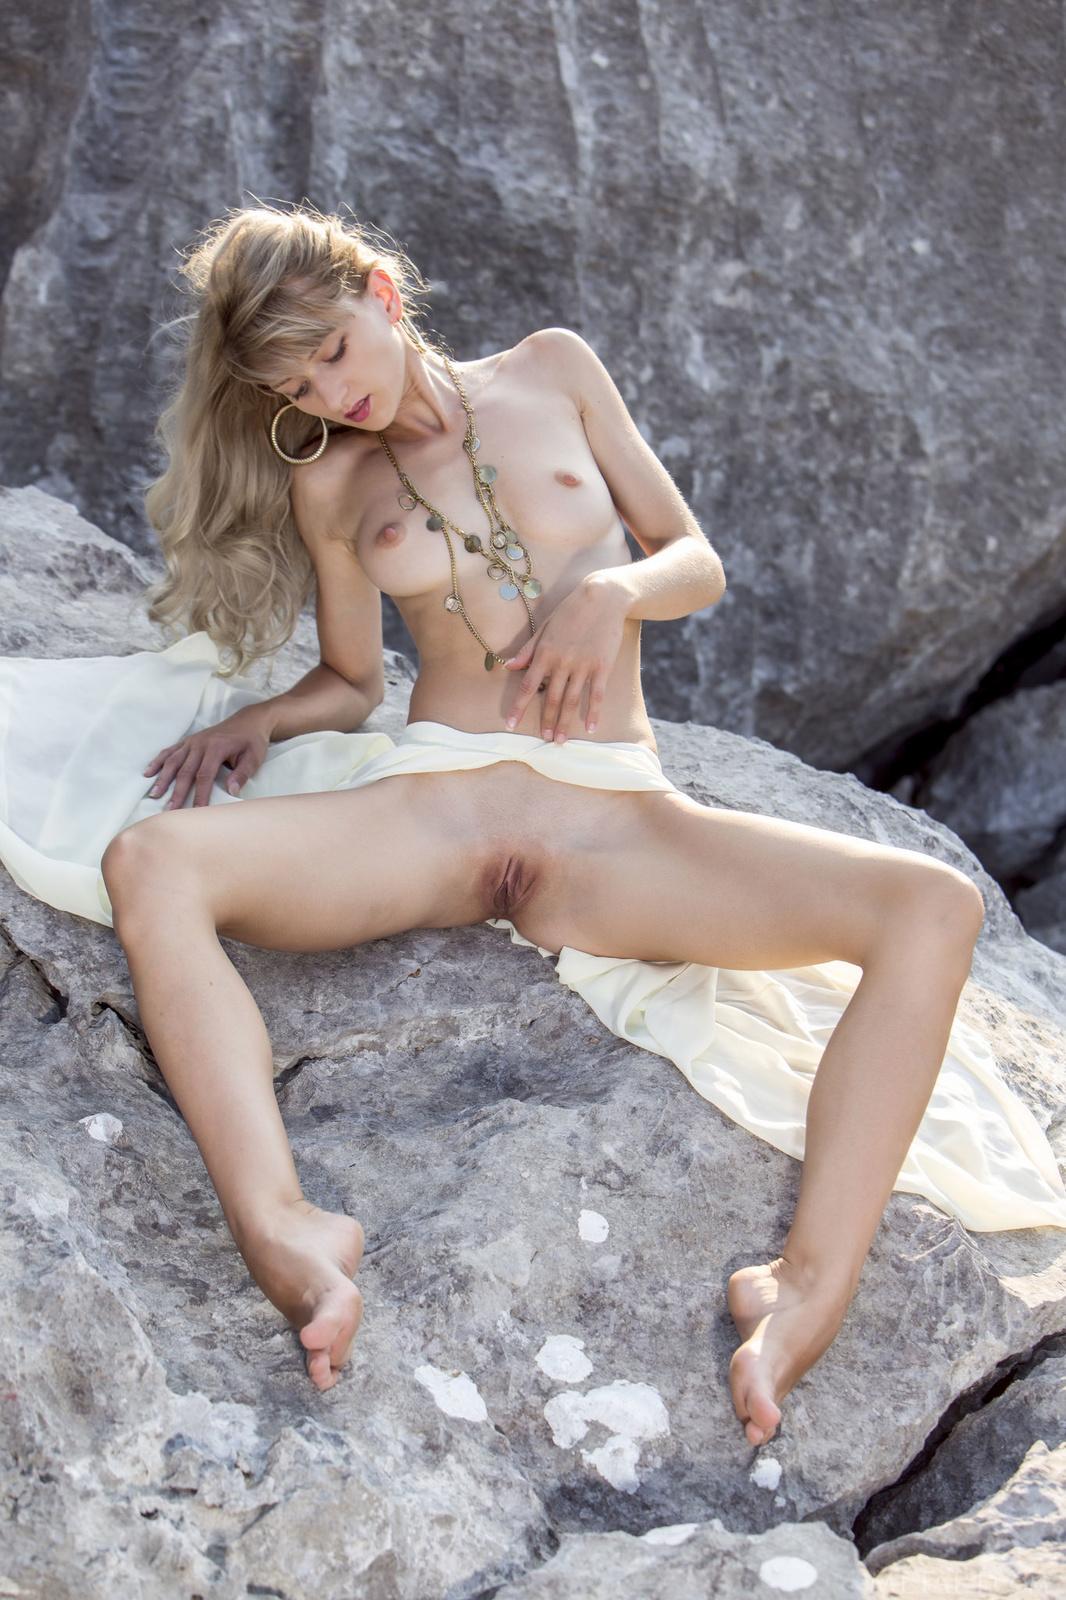 Zdjęcie porno - 04 - Suczka na skale